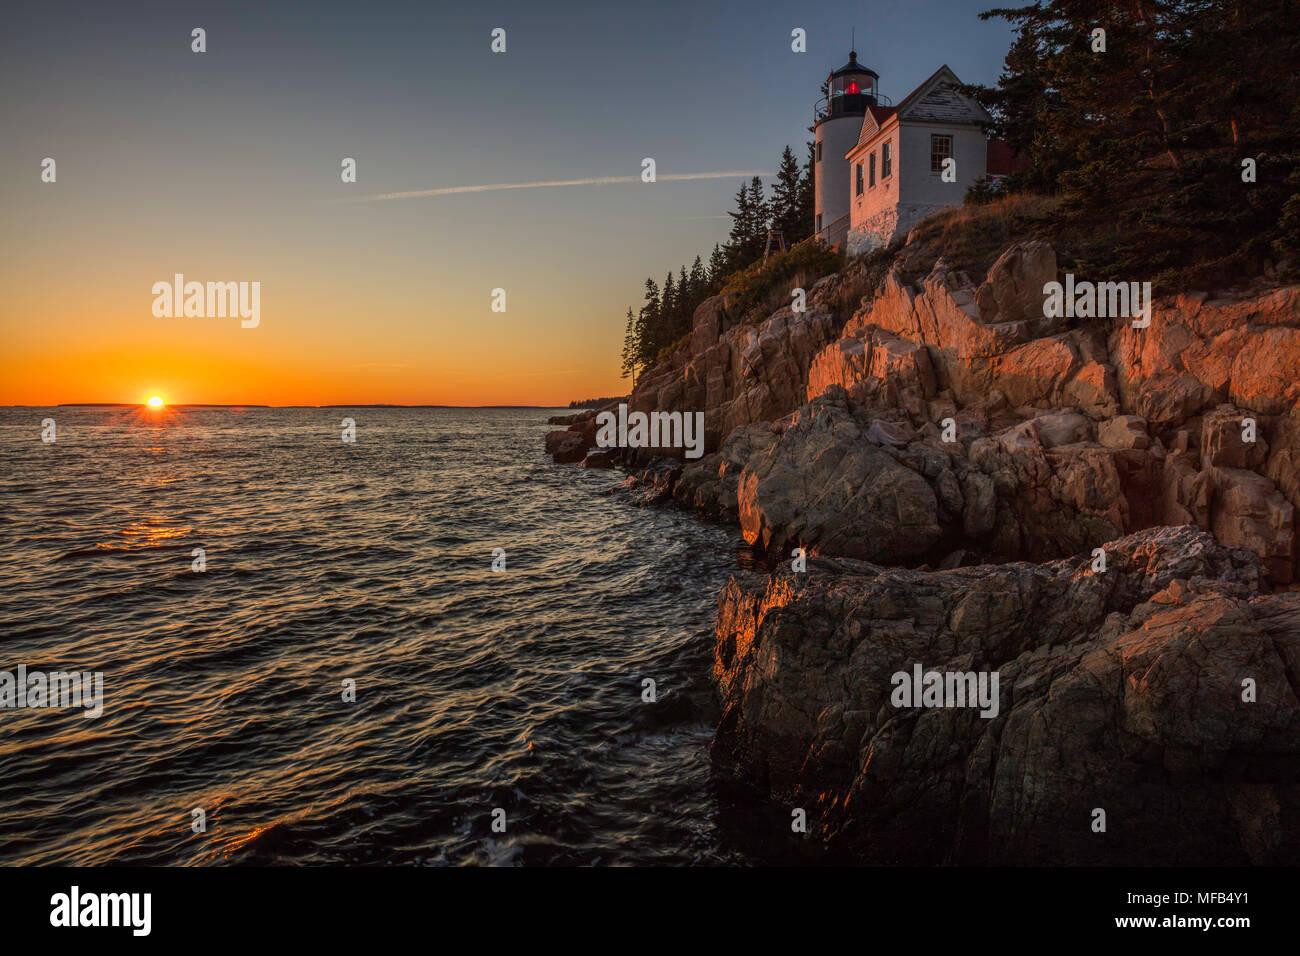 Sunset at Bass Harbor Head Lighthouse, Acadia National Park, Maine Stock Photo